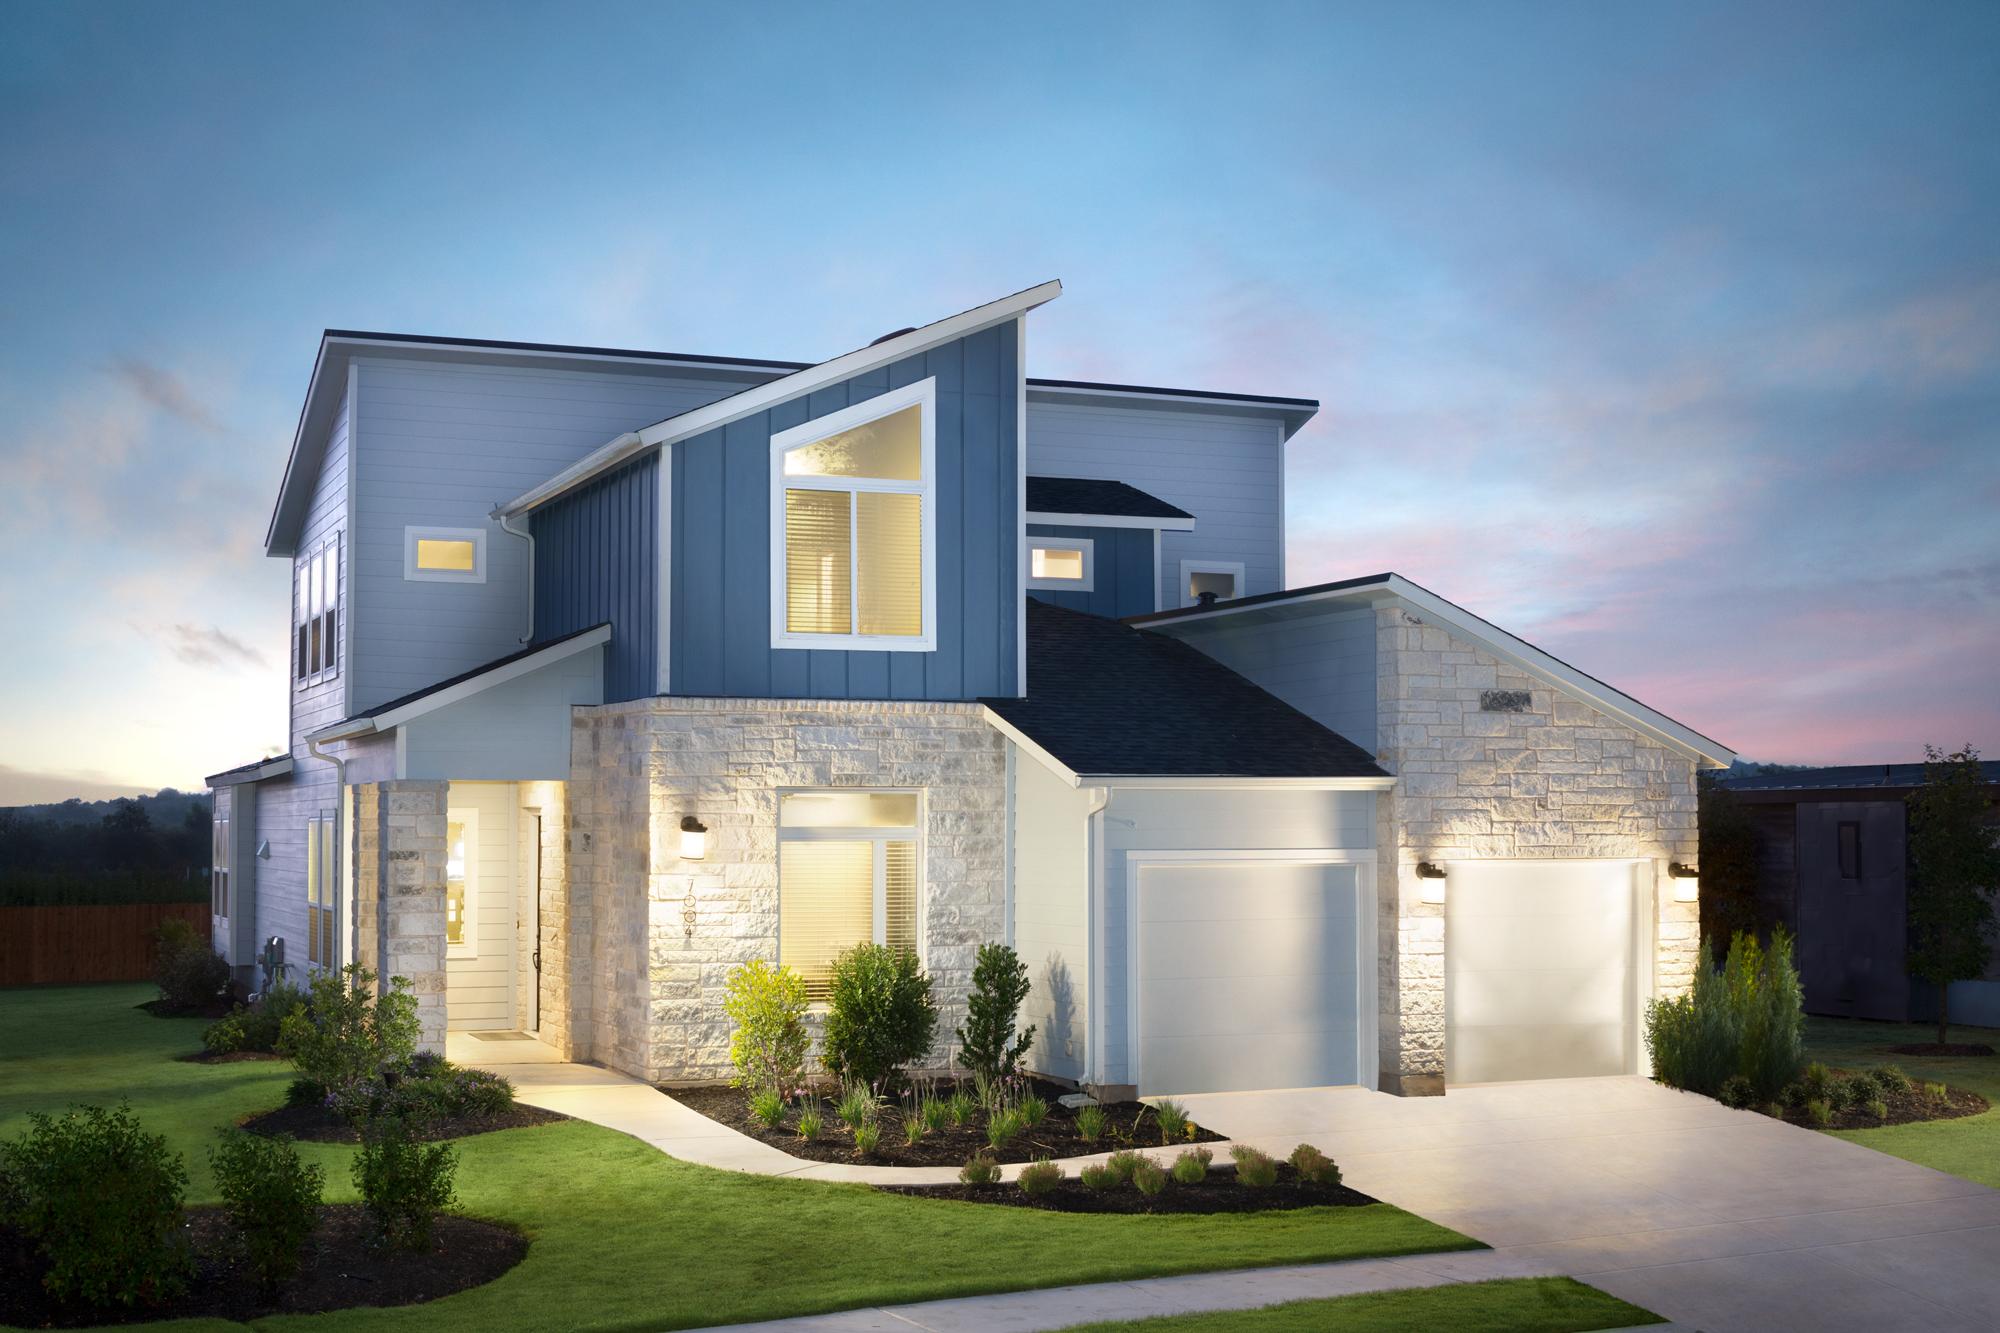 austin-residential-architectural-photographer.jpg